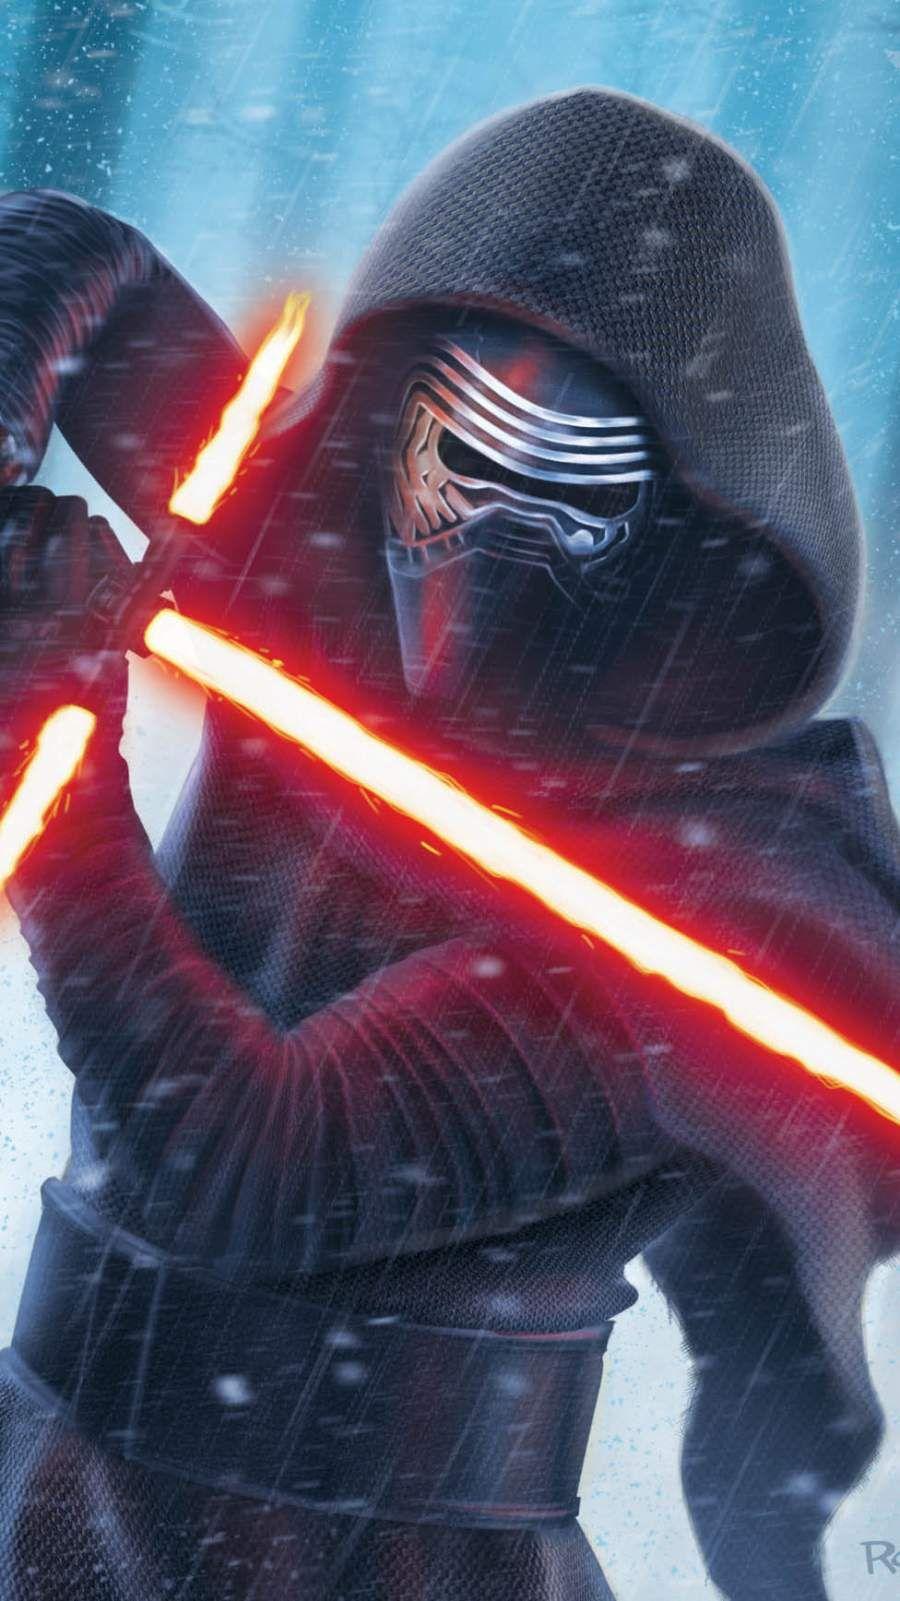 Star Wars Kylo Ren iPhone Wallpaper Star wars wallpaper